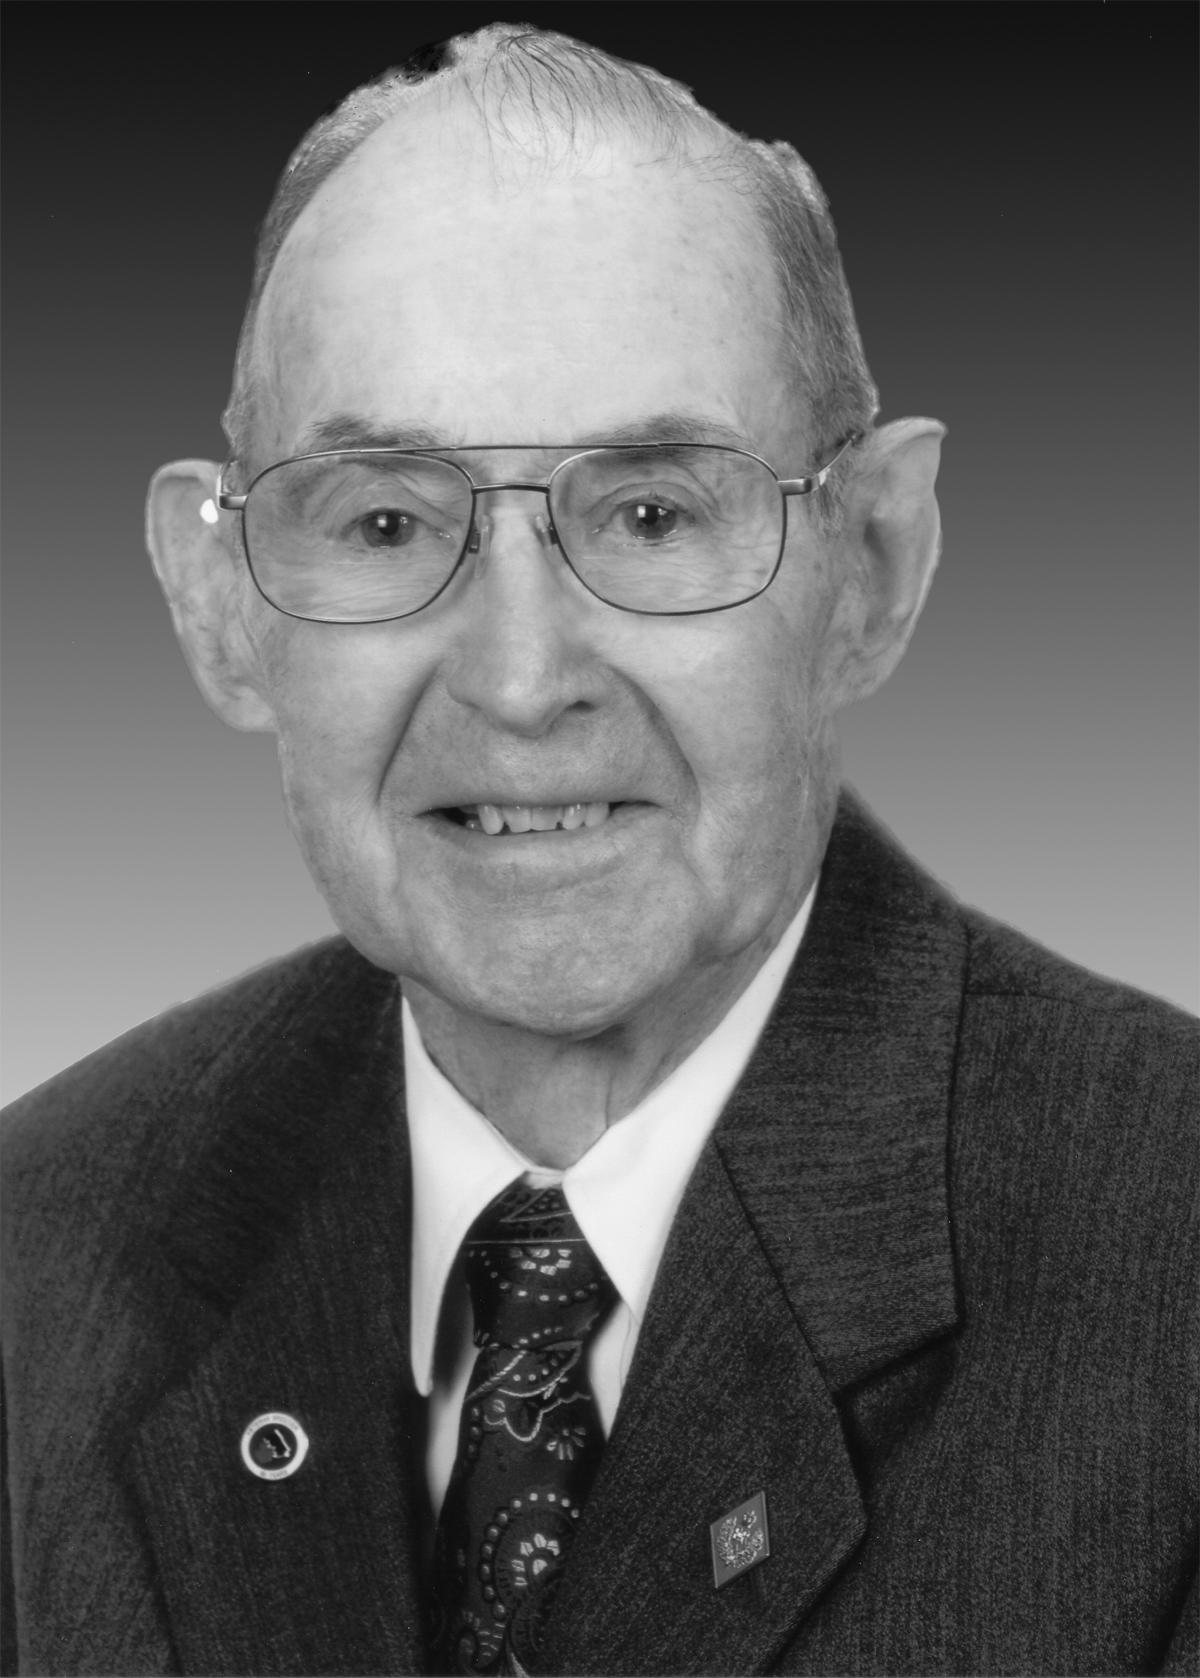 James Ronald Warner